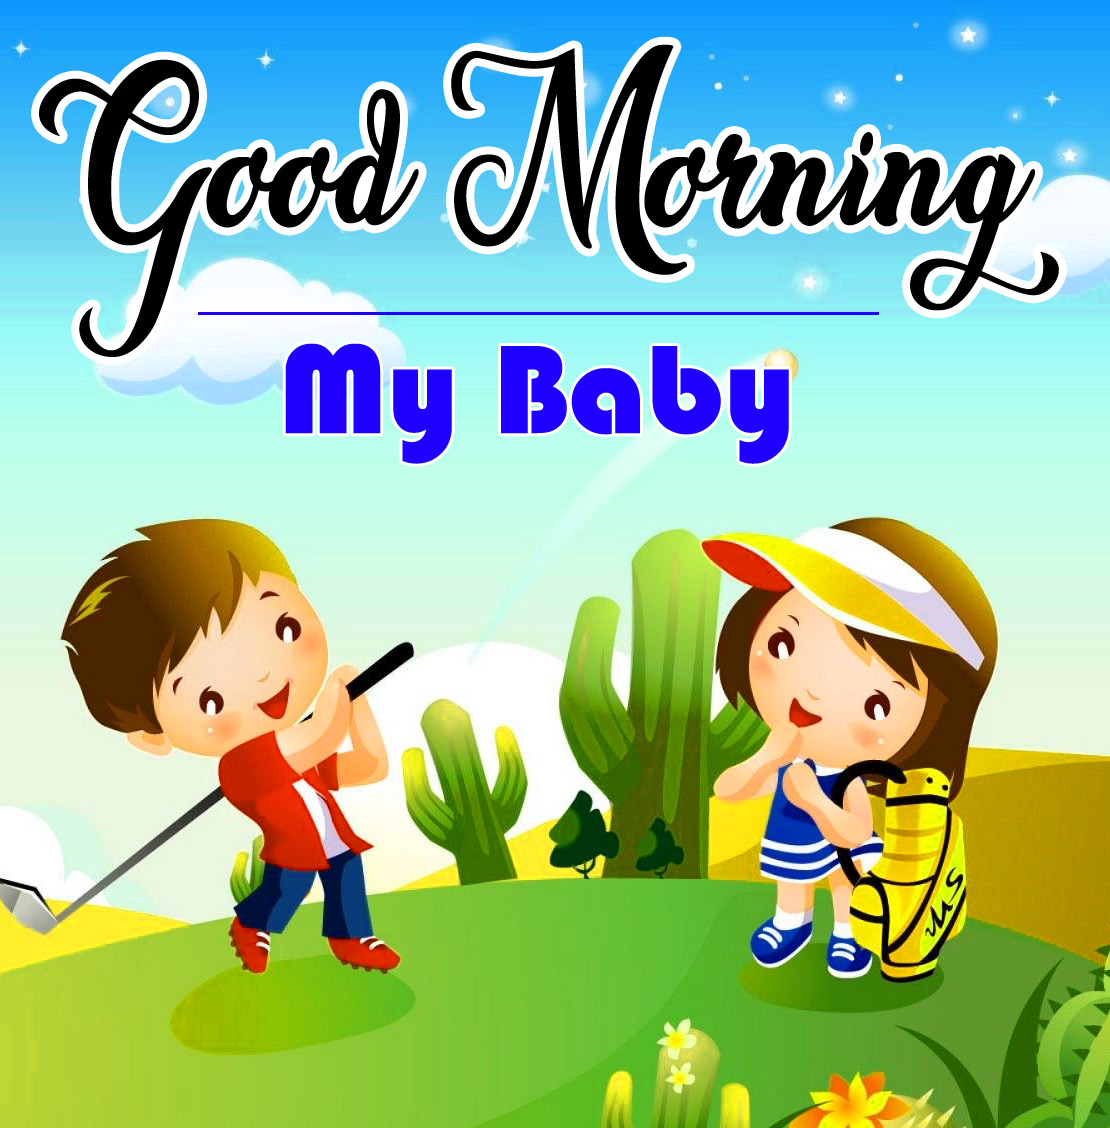 Cartoon Good Morning Images 4